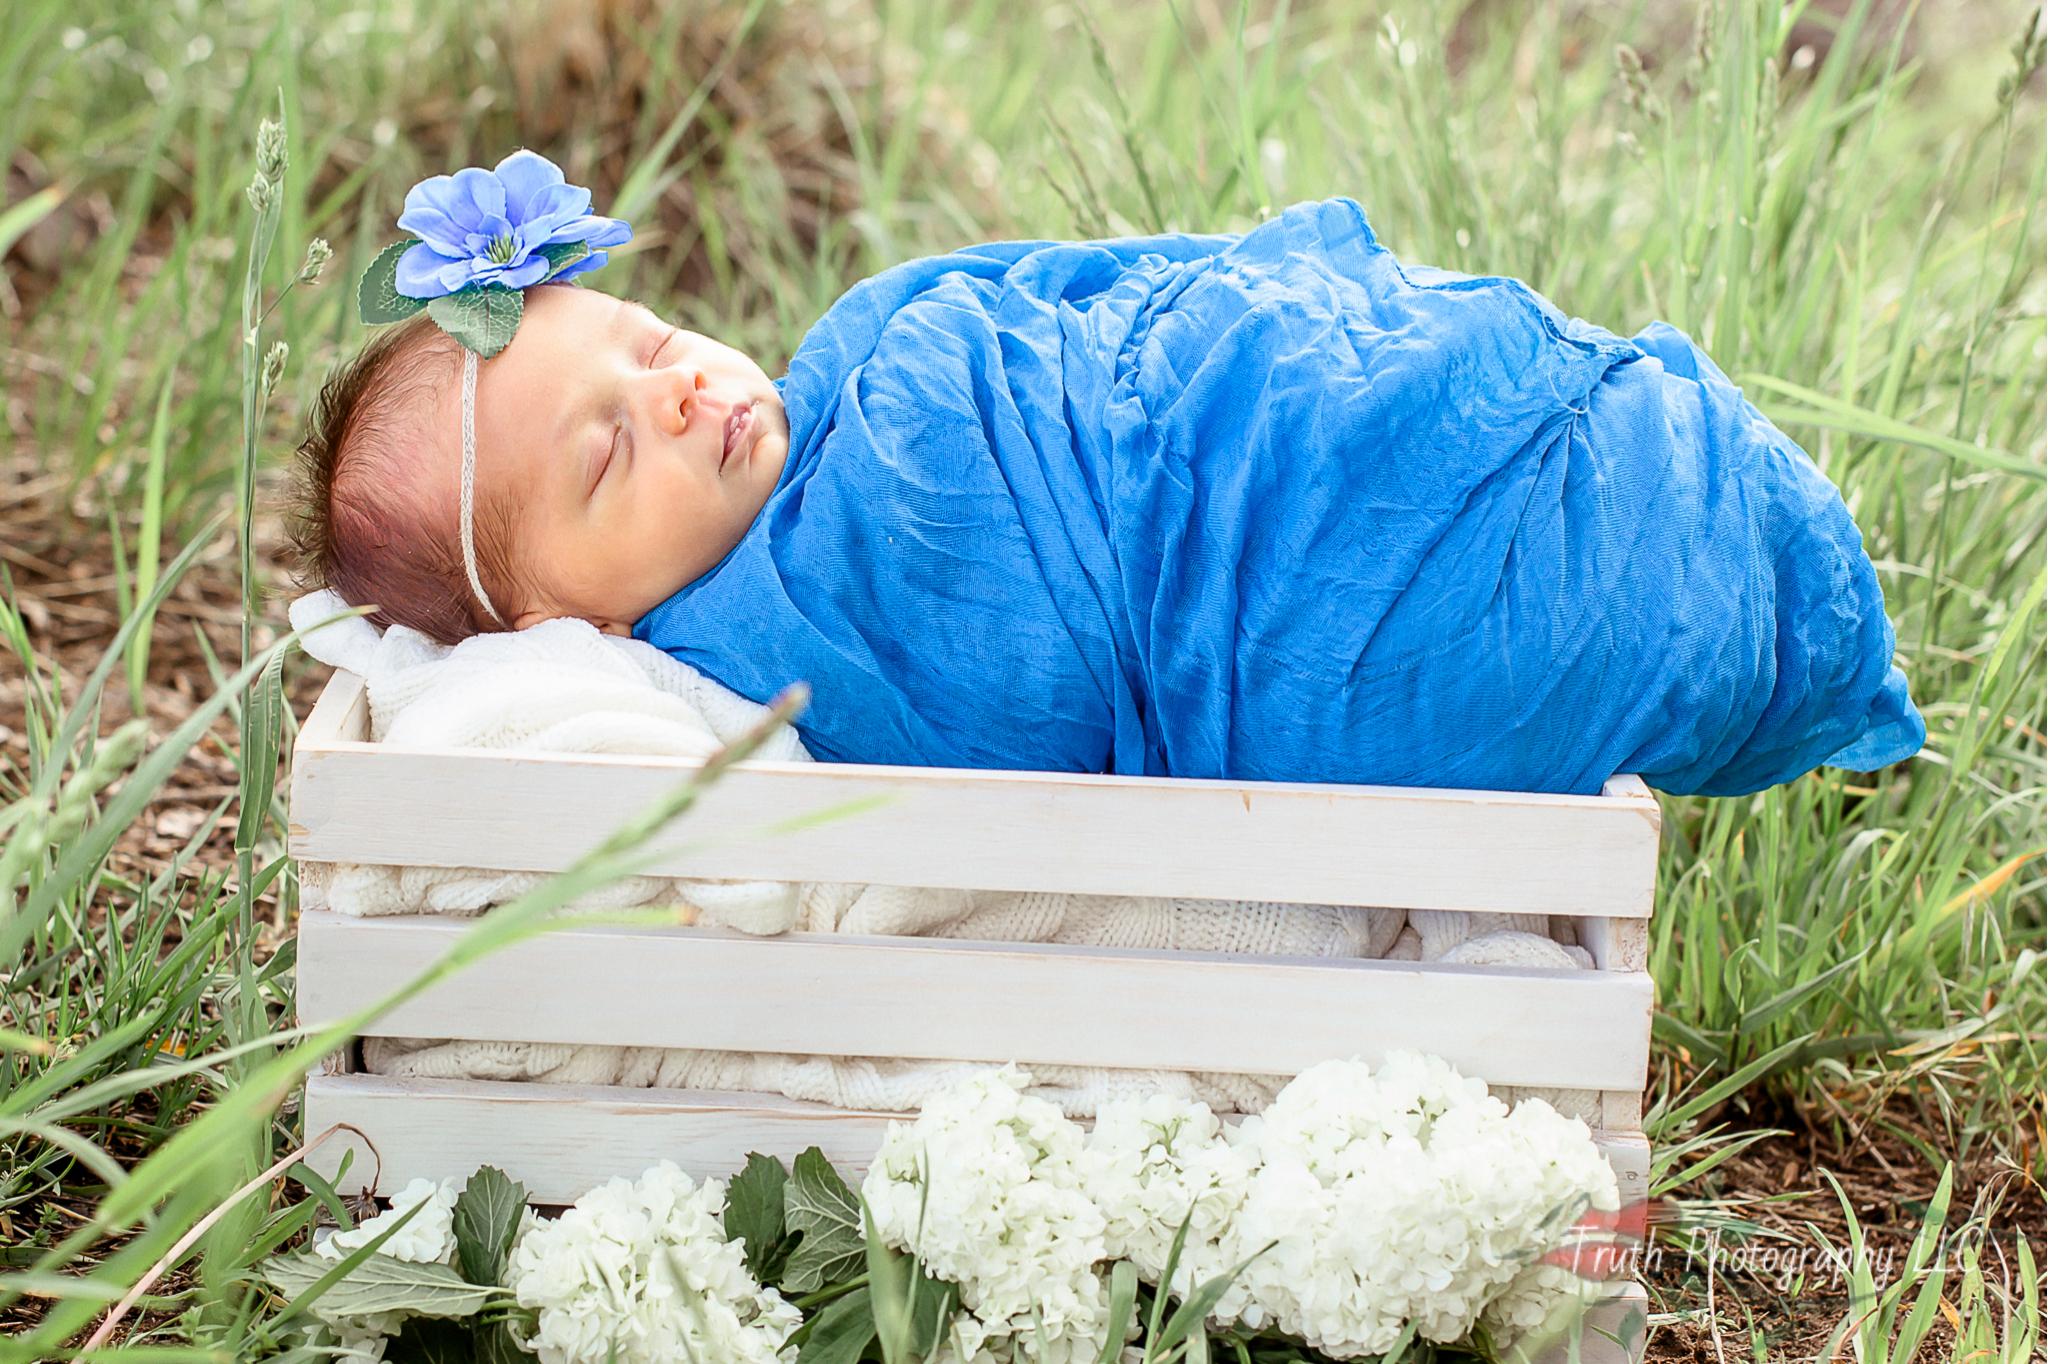 Truth-Photography-Denver-Outdoor-infant-photographers.jpg